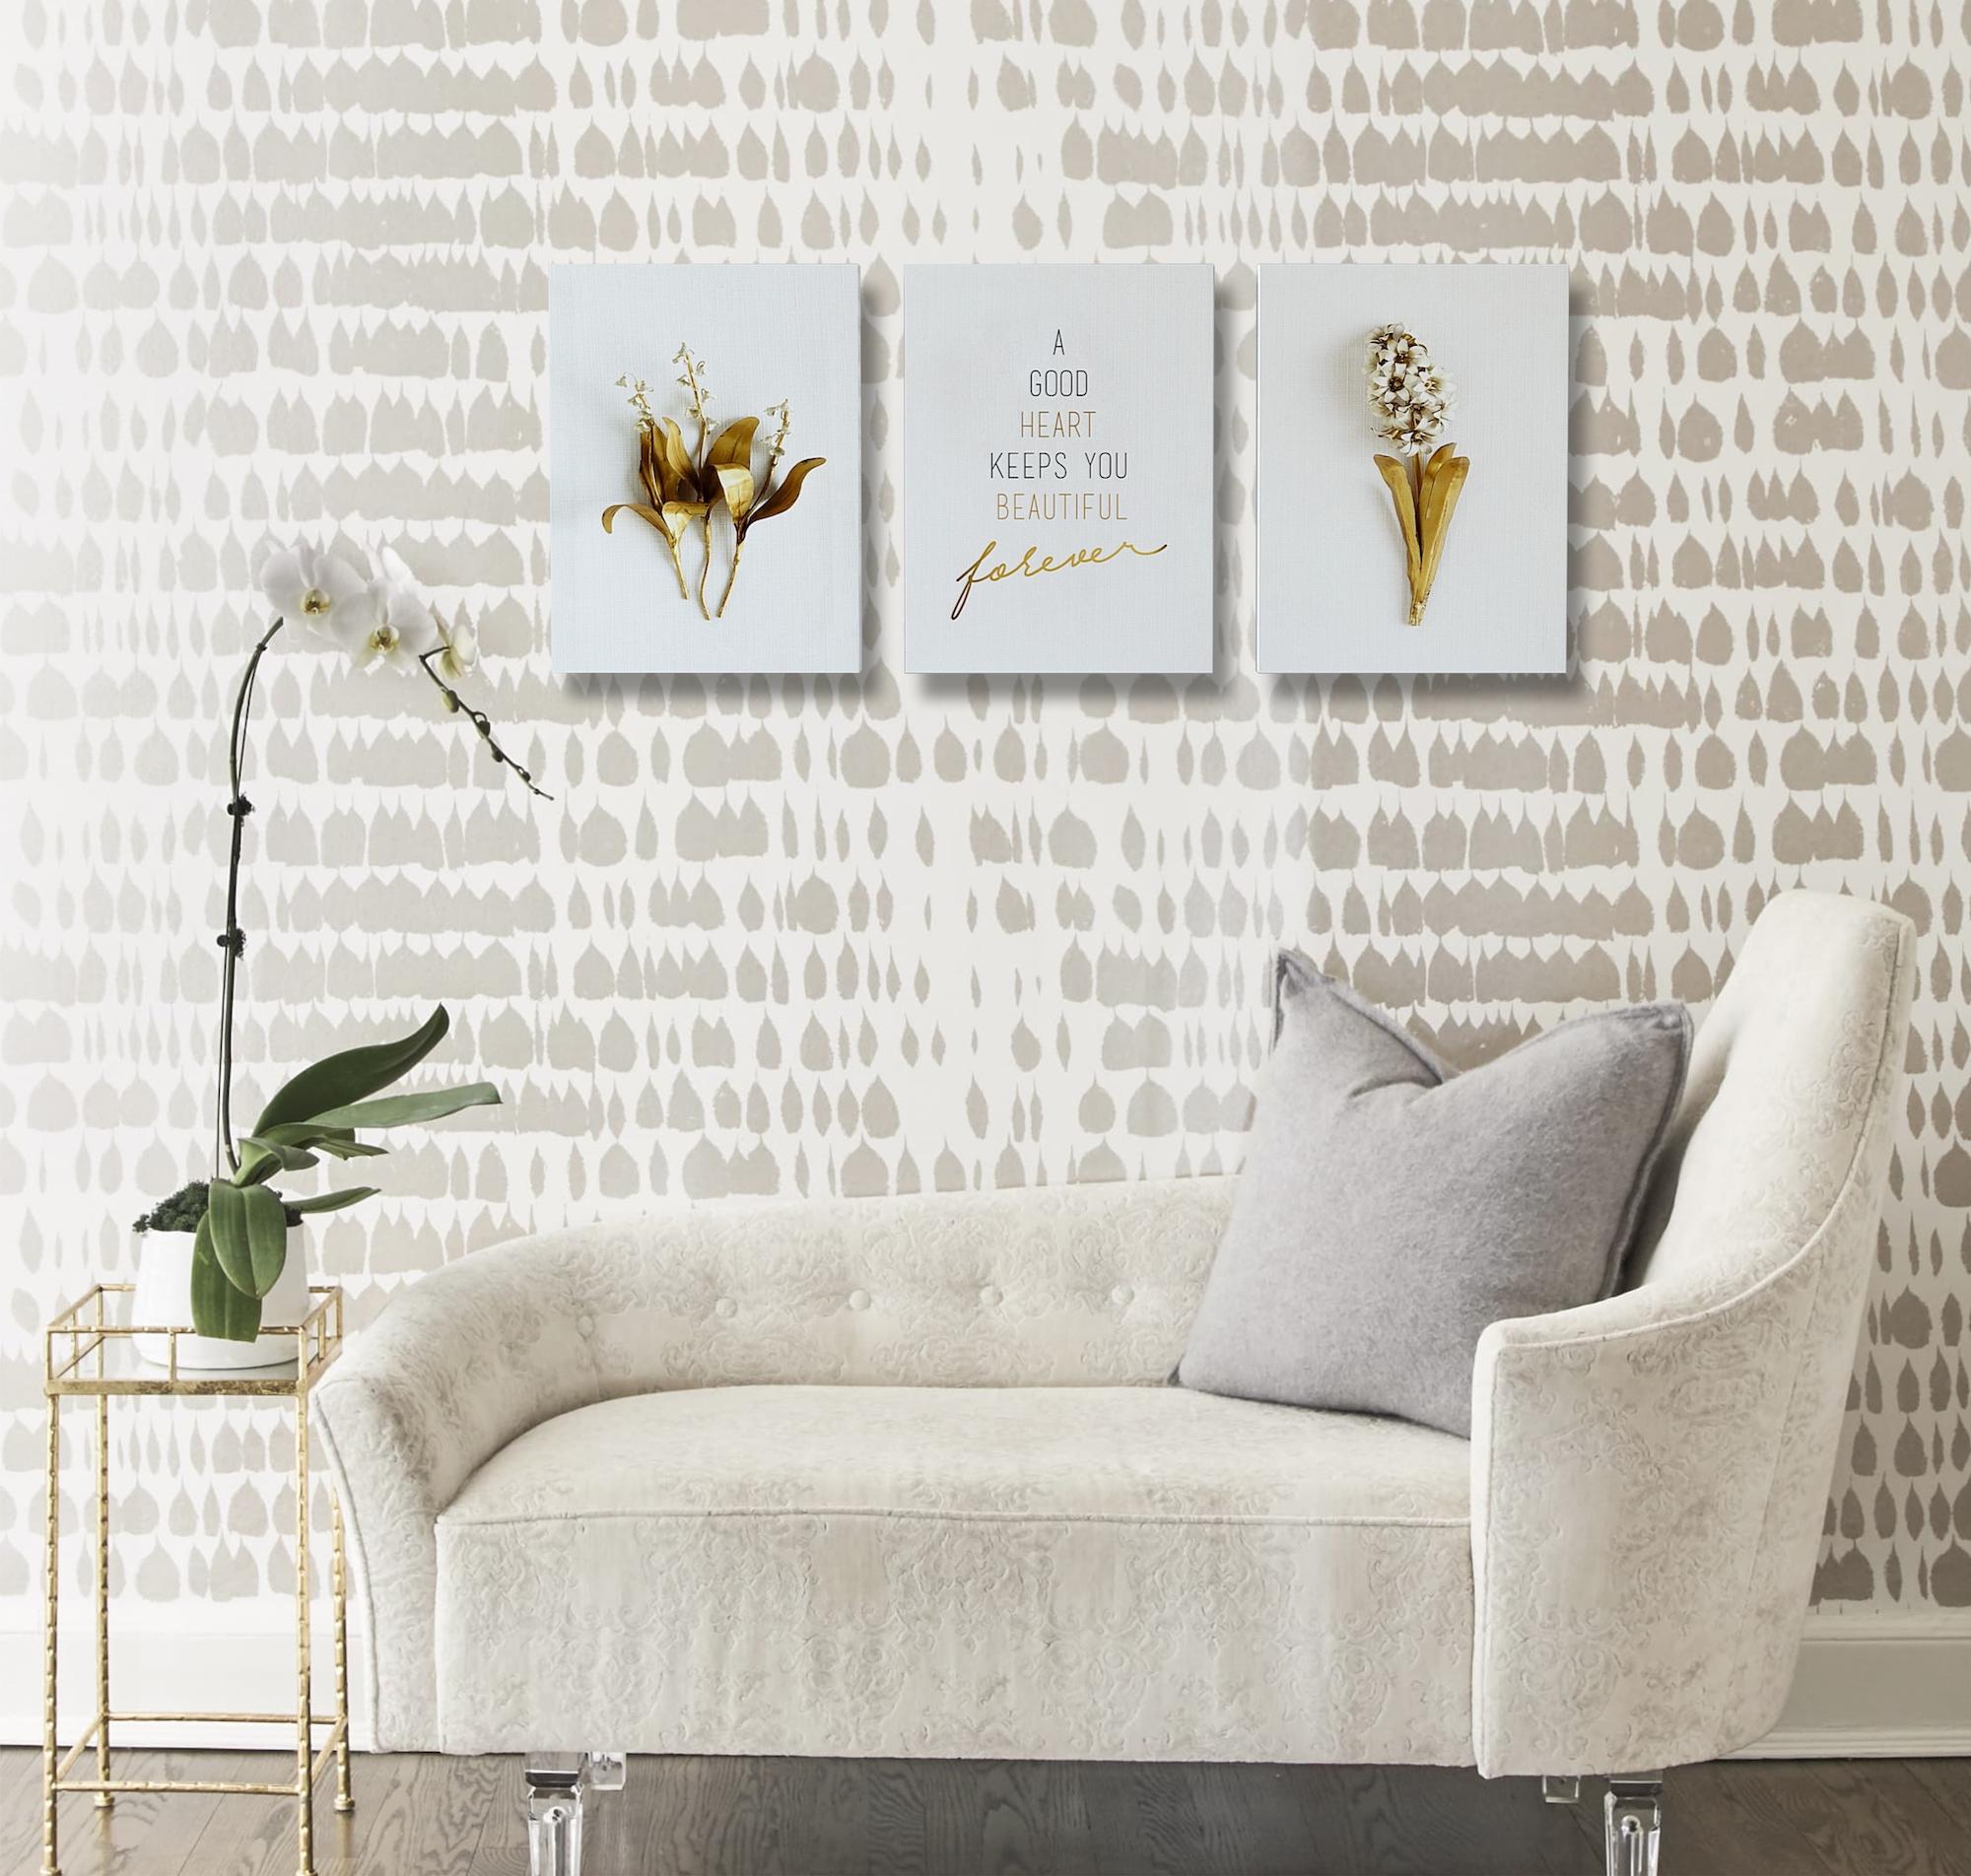 EnjoyTheLittleThings Canvas Wall Art Prints - Bedroom Home Living Room Office Kitchen Decorations - Modern Artwork Motivational Phrases [Set of 3]